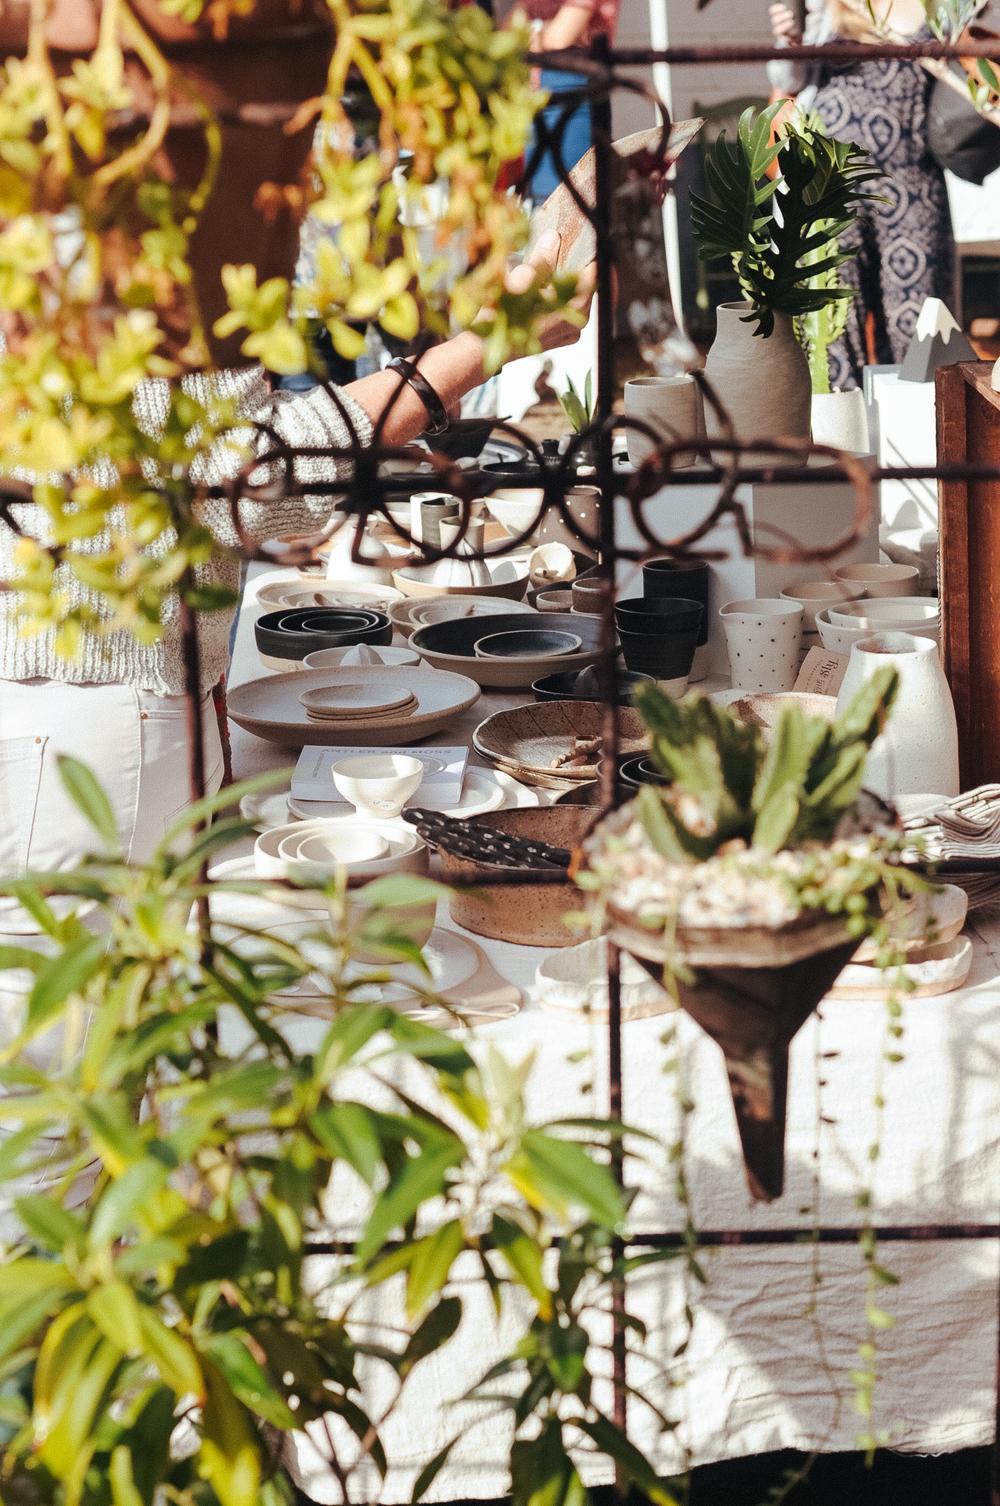 Autumn Market Images-4726.jpg